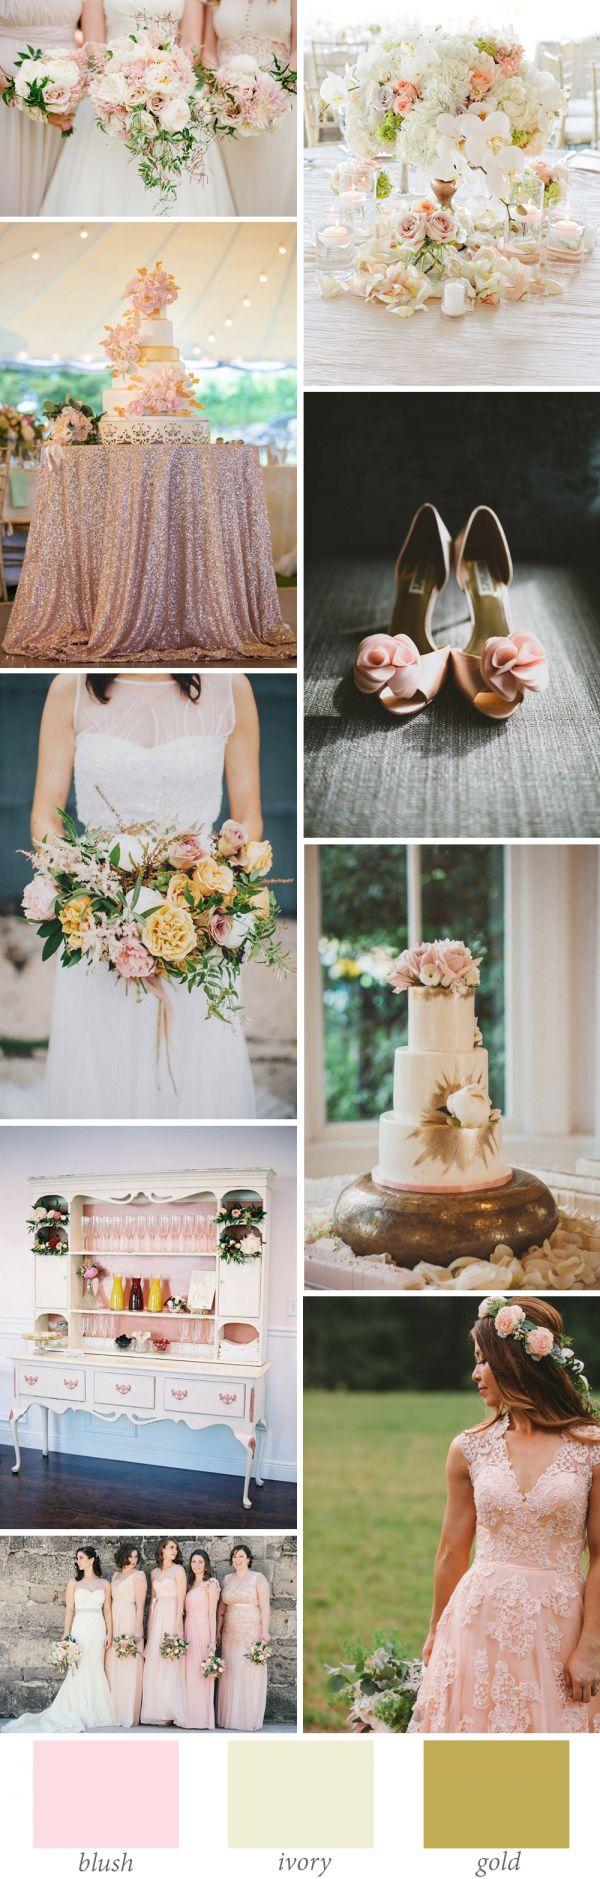 Romantic Blush, Ivory, and Gold Wedding Palette Inspiration